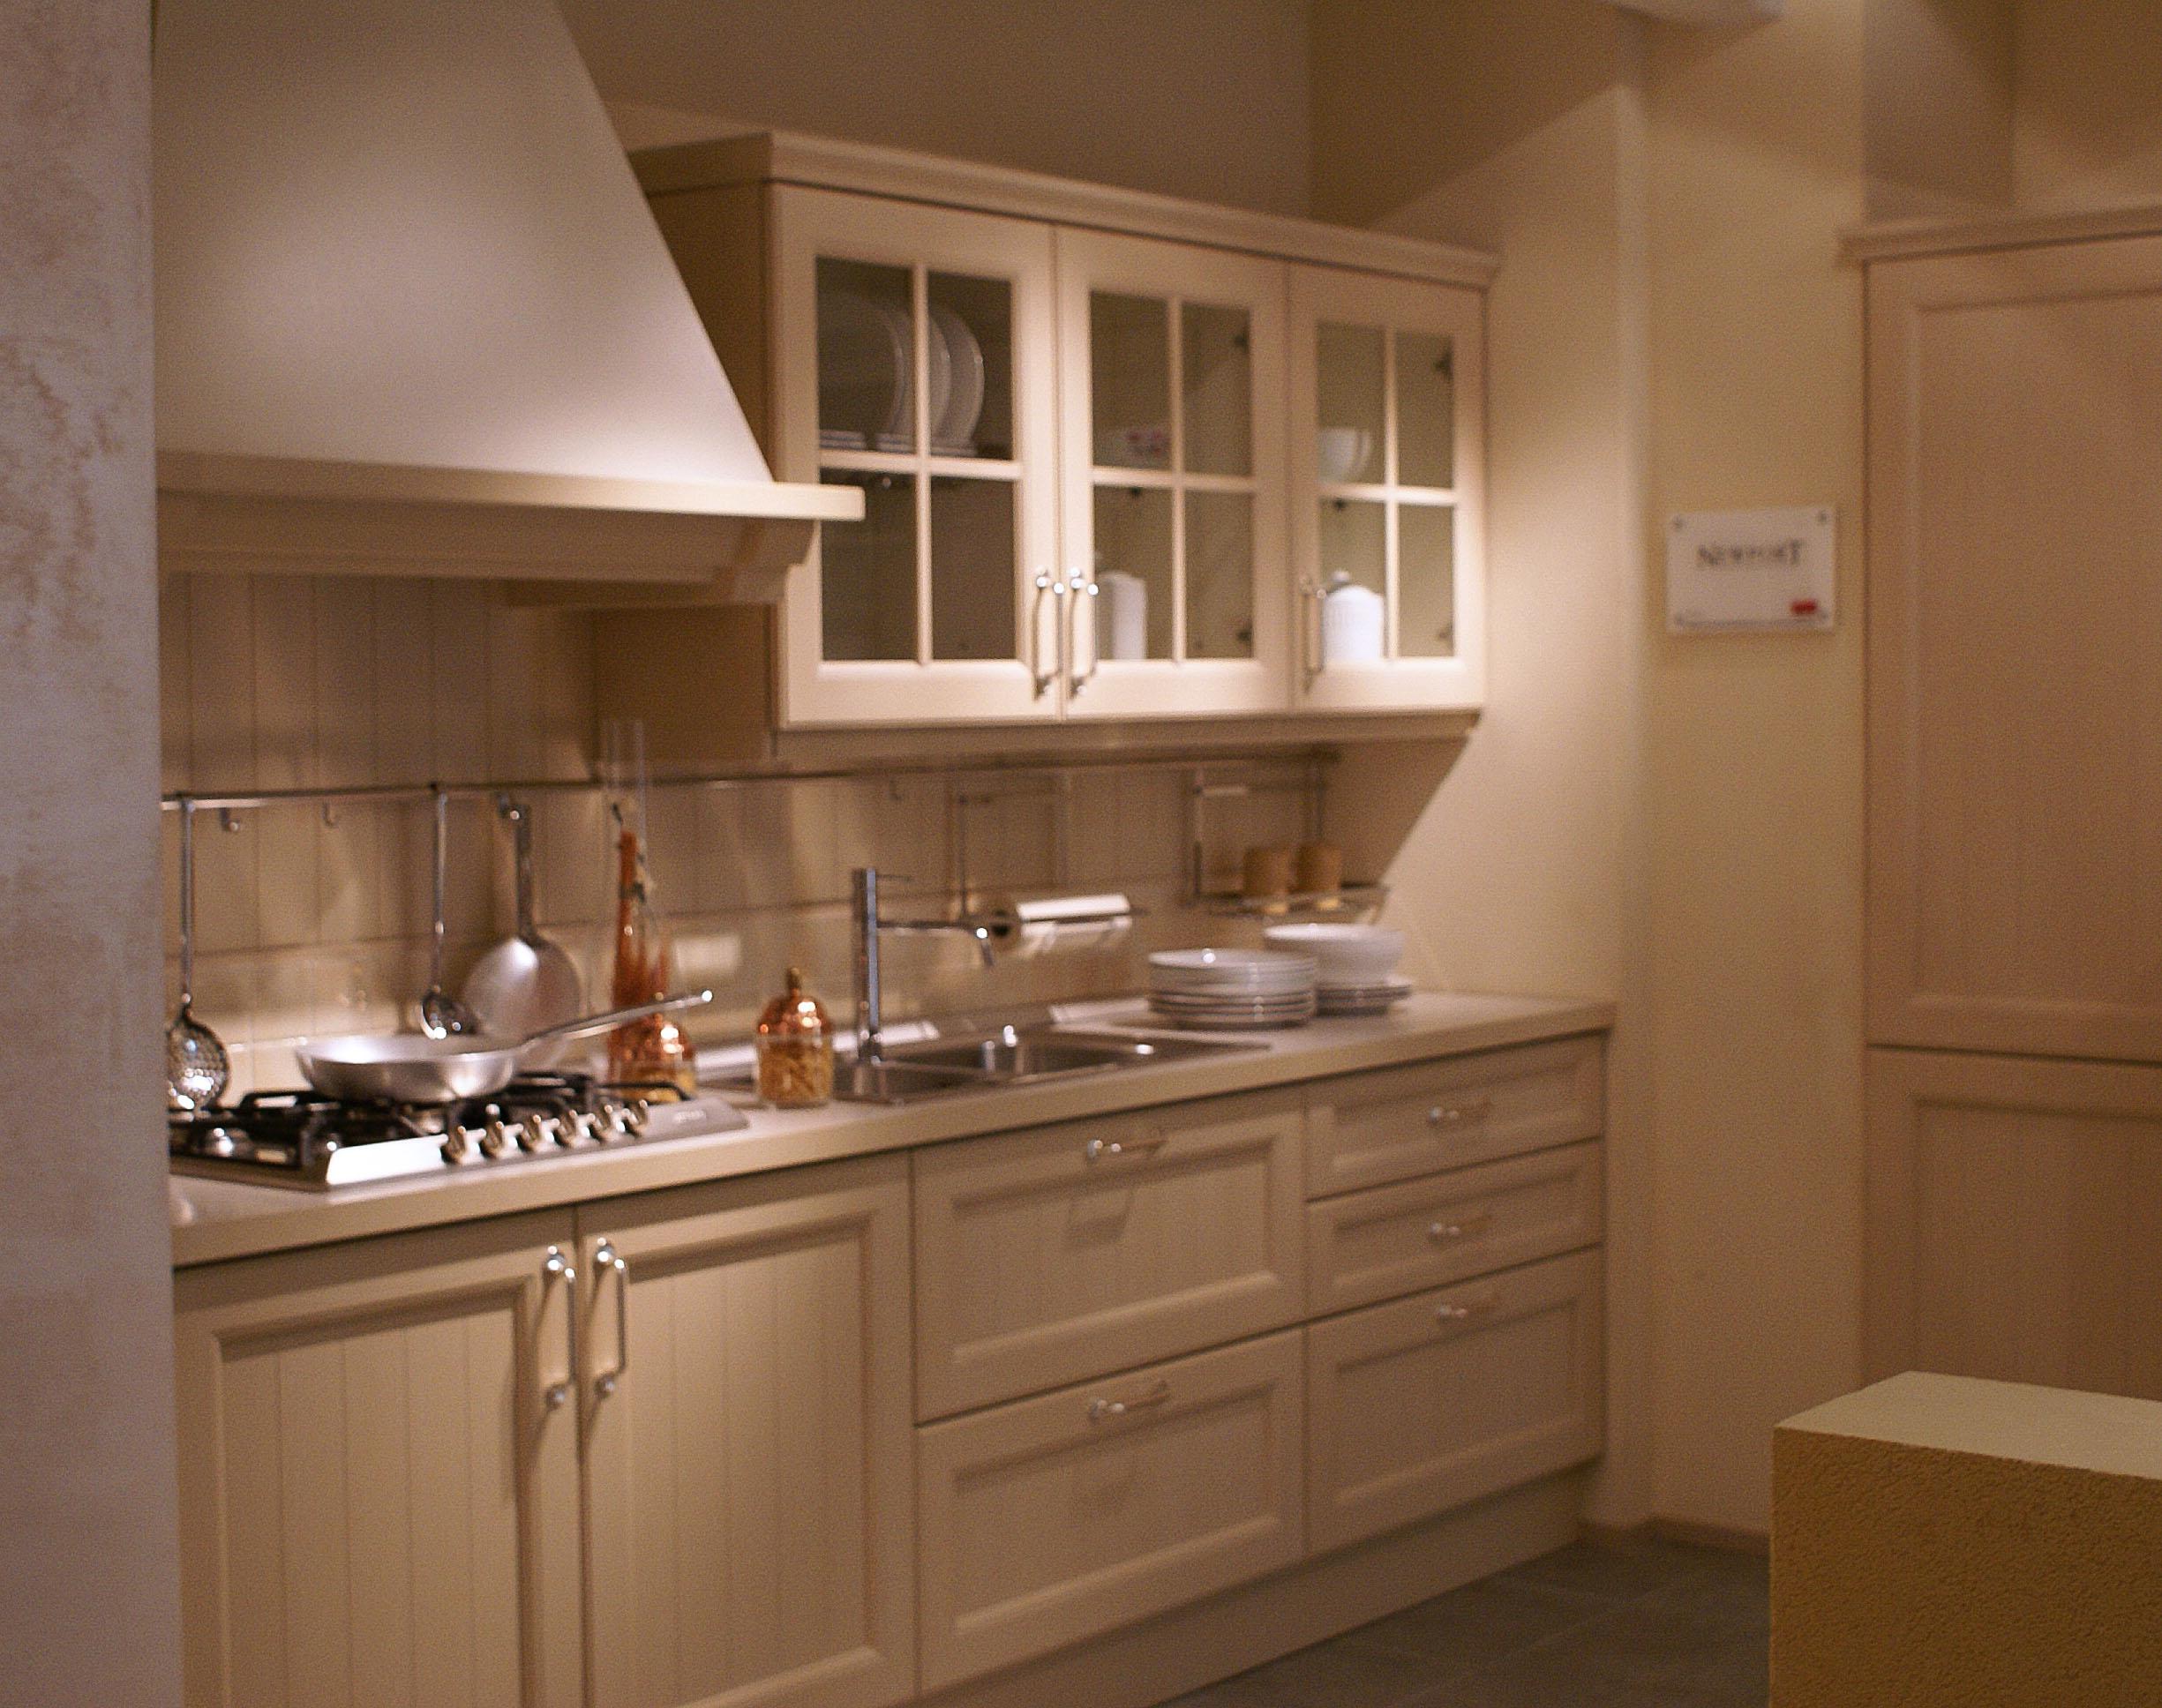 Cucina veneta cucine newport legno rovere cipria country - Cucine veneta prezzi ...